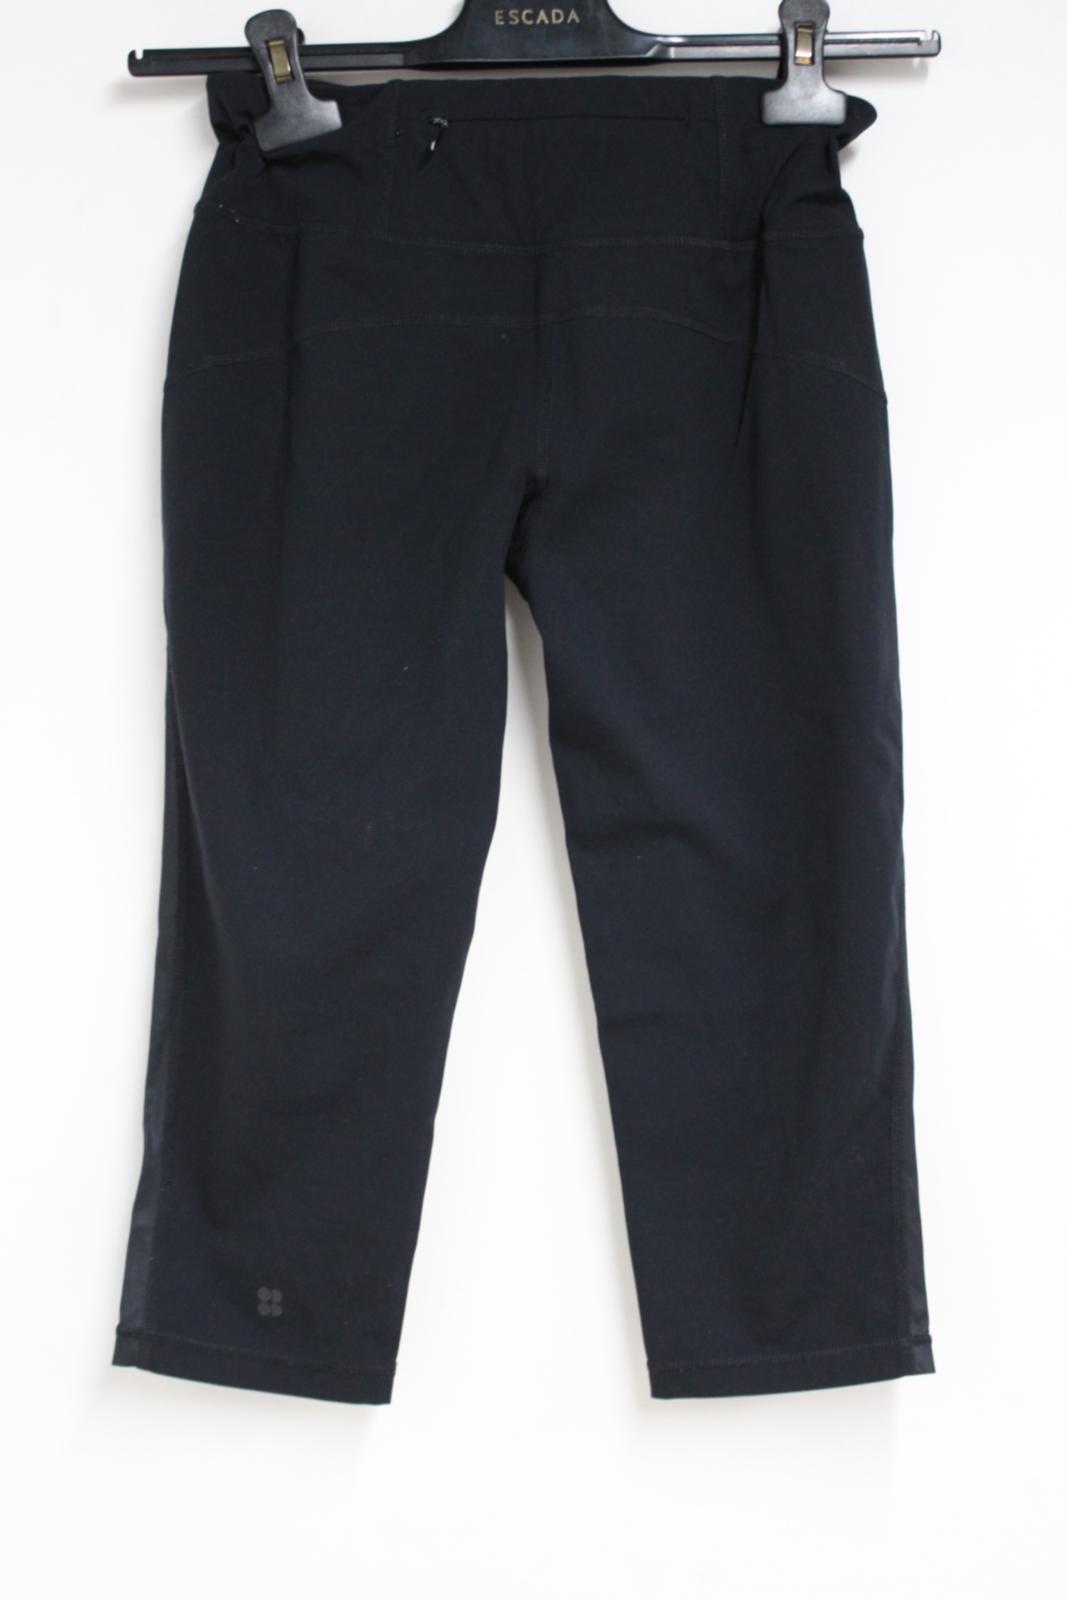 Sweaty-Betty-Ladies-Negro-3-4-piernas-Corto-Leggings-Activewear-pequeno-W26-L16 miniatura 6